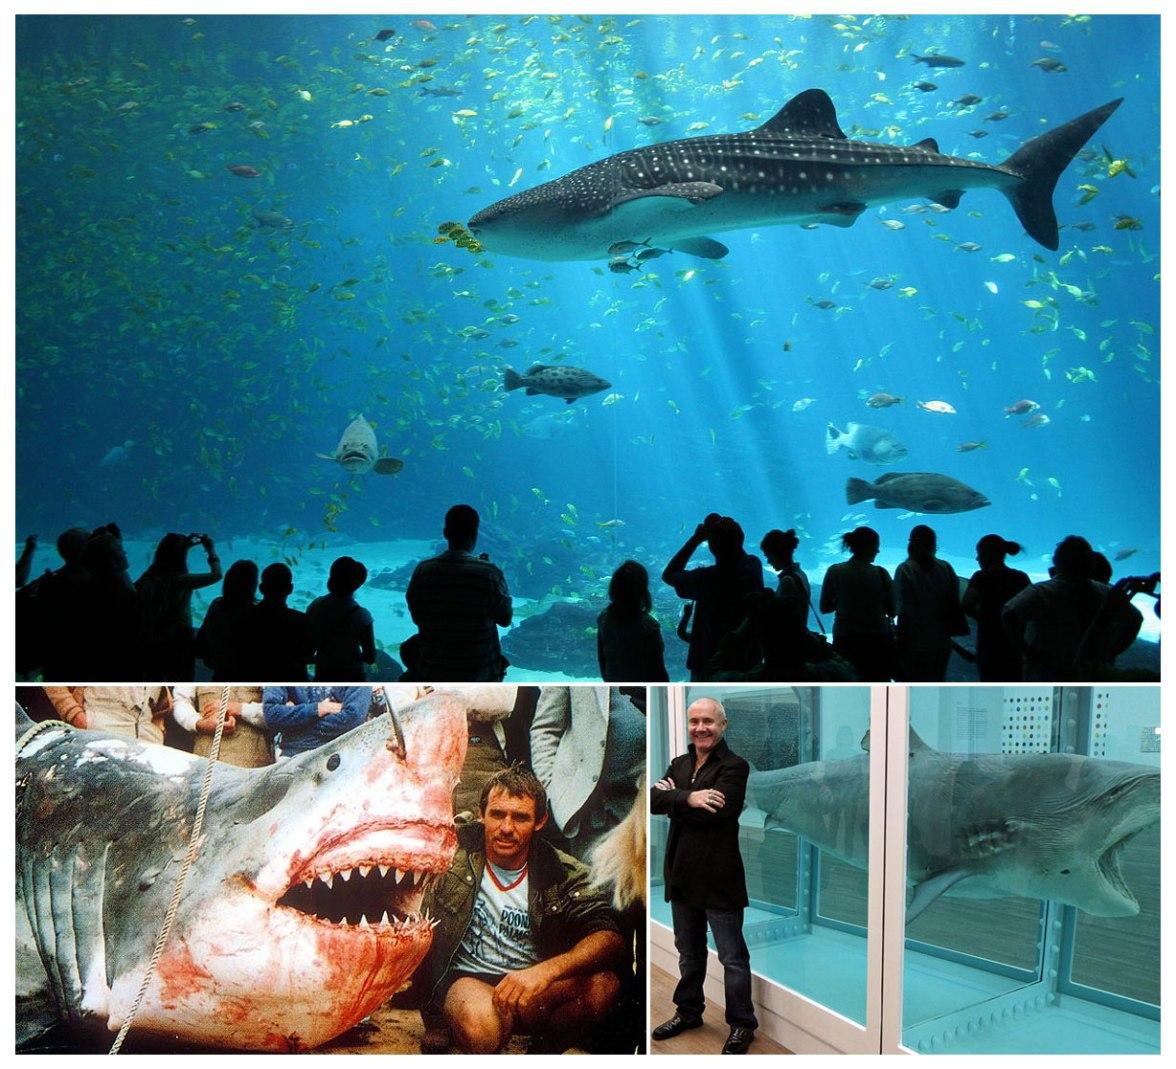 Sharks in aquariums versus live caught versus Damien Hirst shark in tank